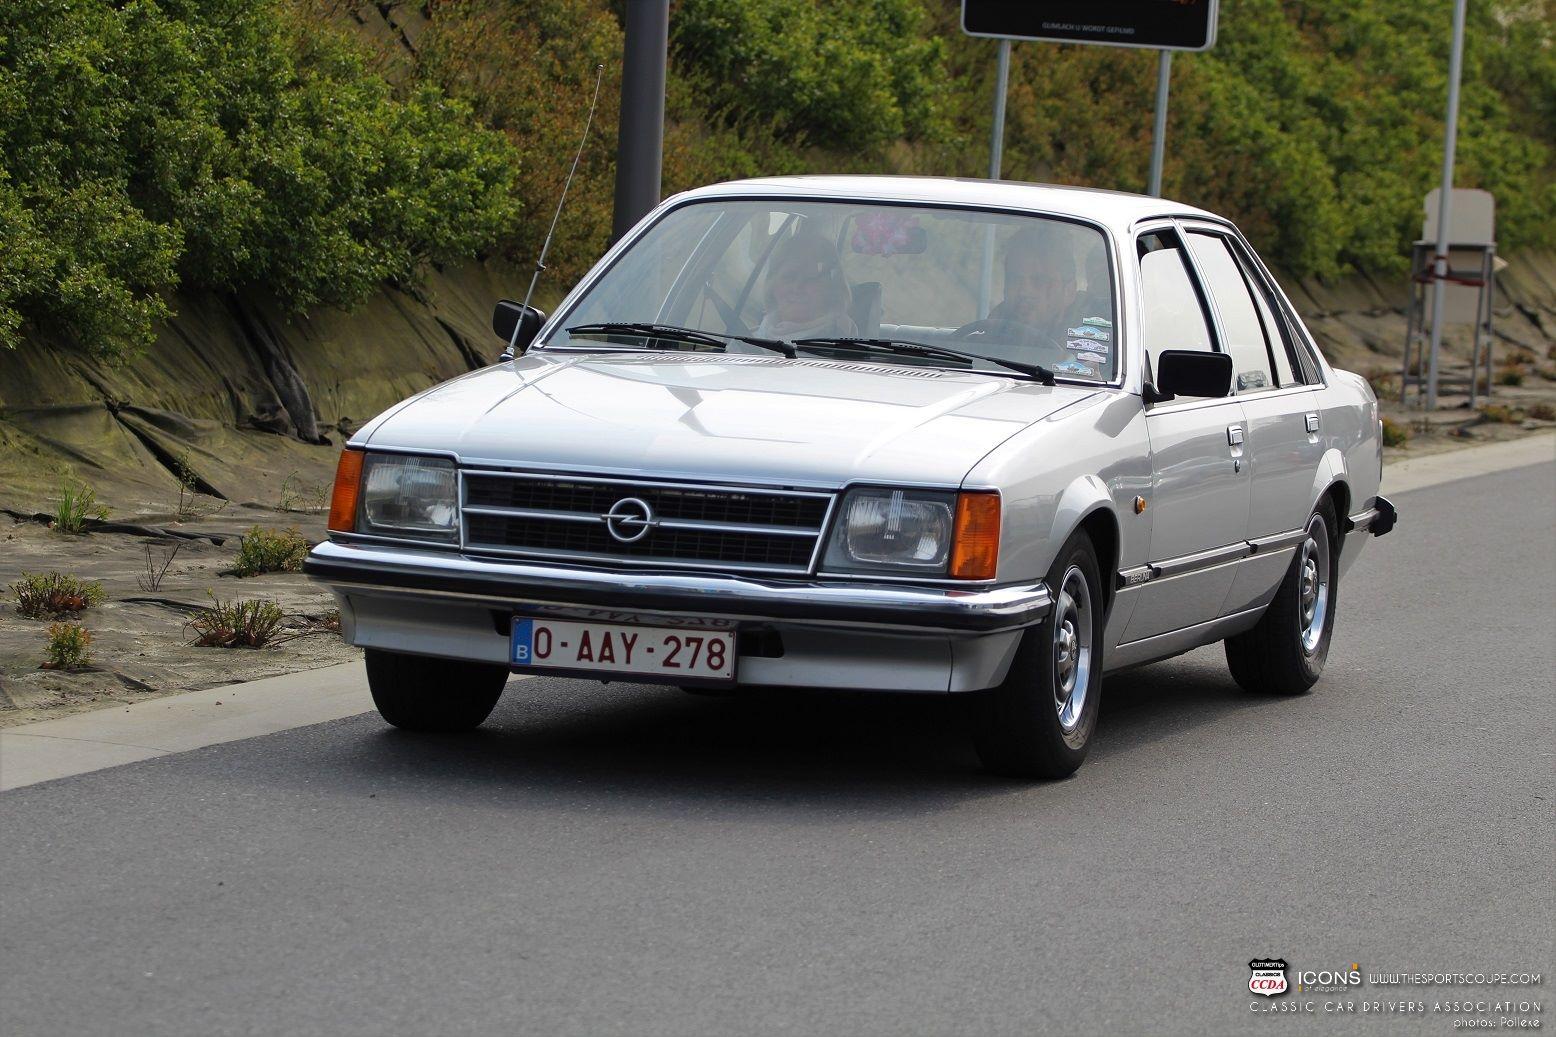 Opel-mix--7-4-2019--23